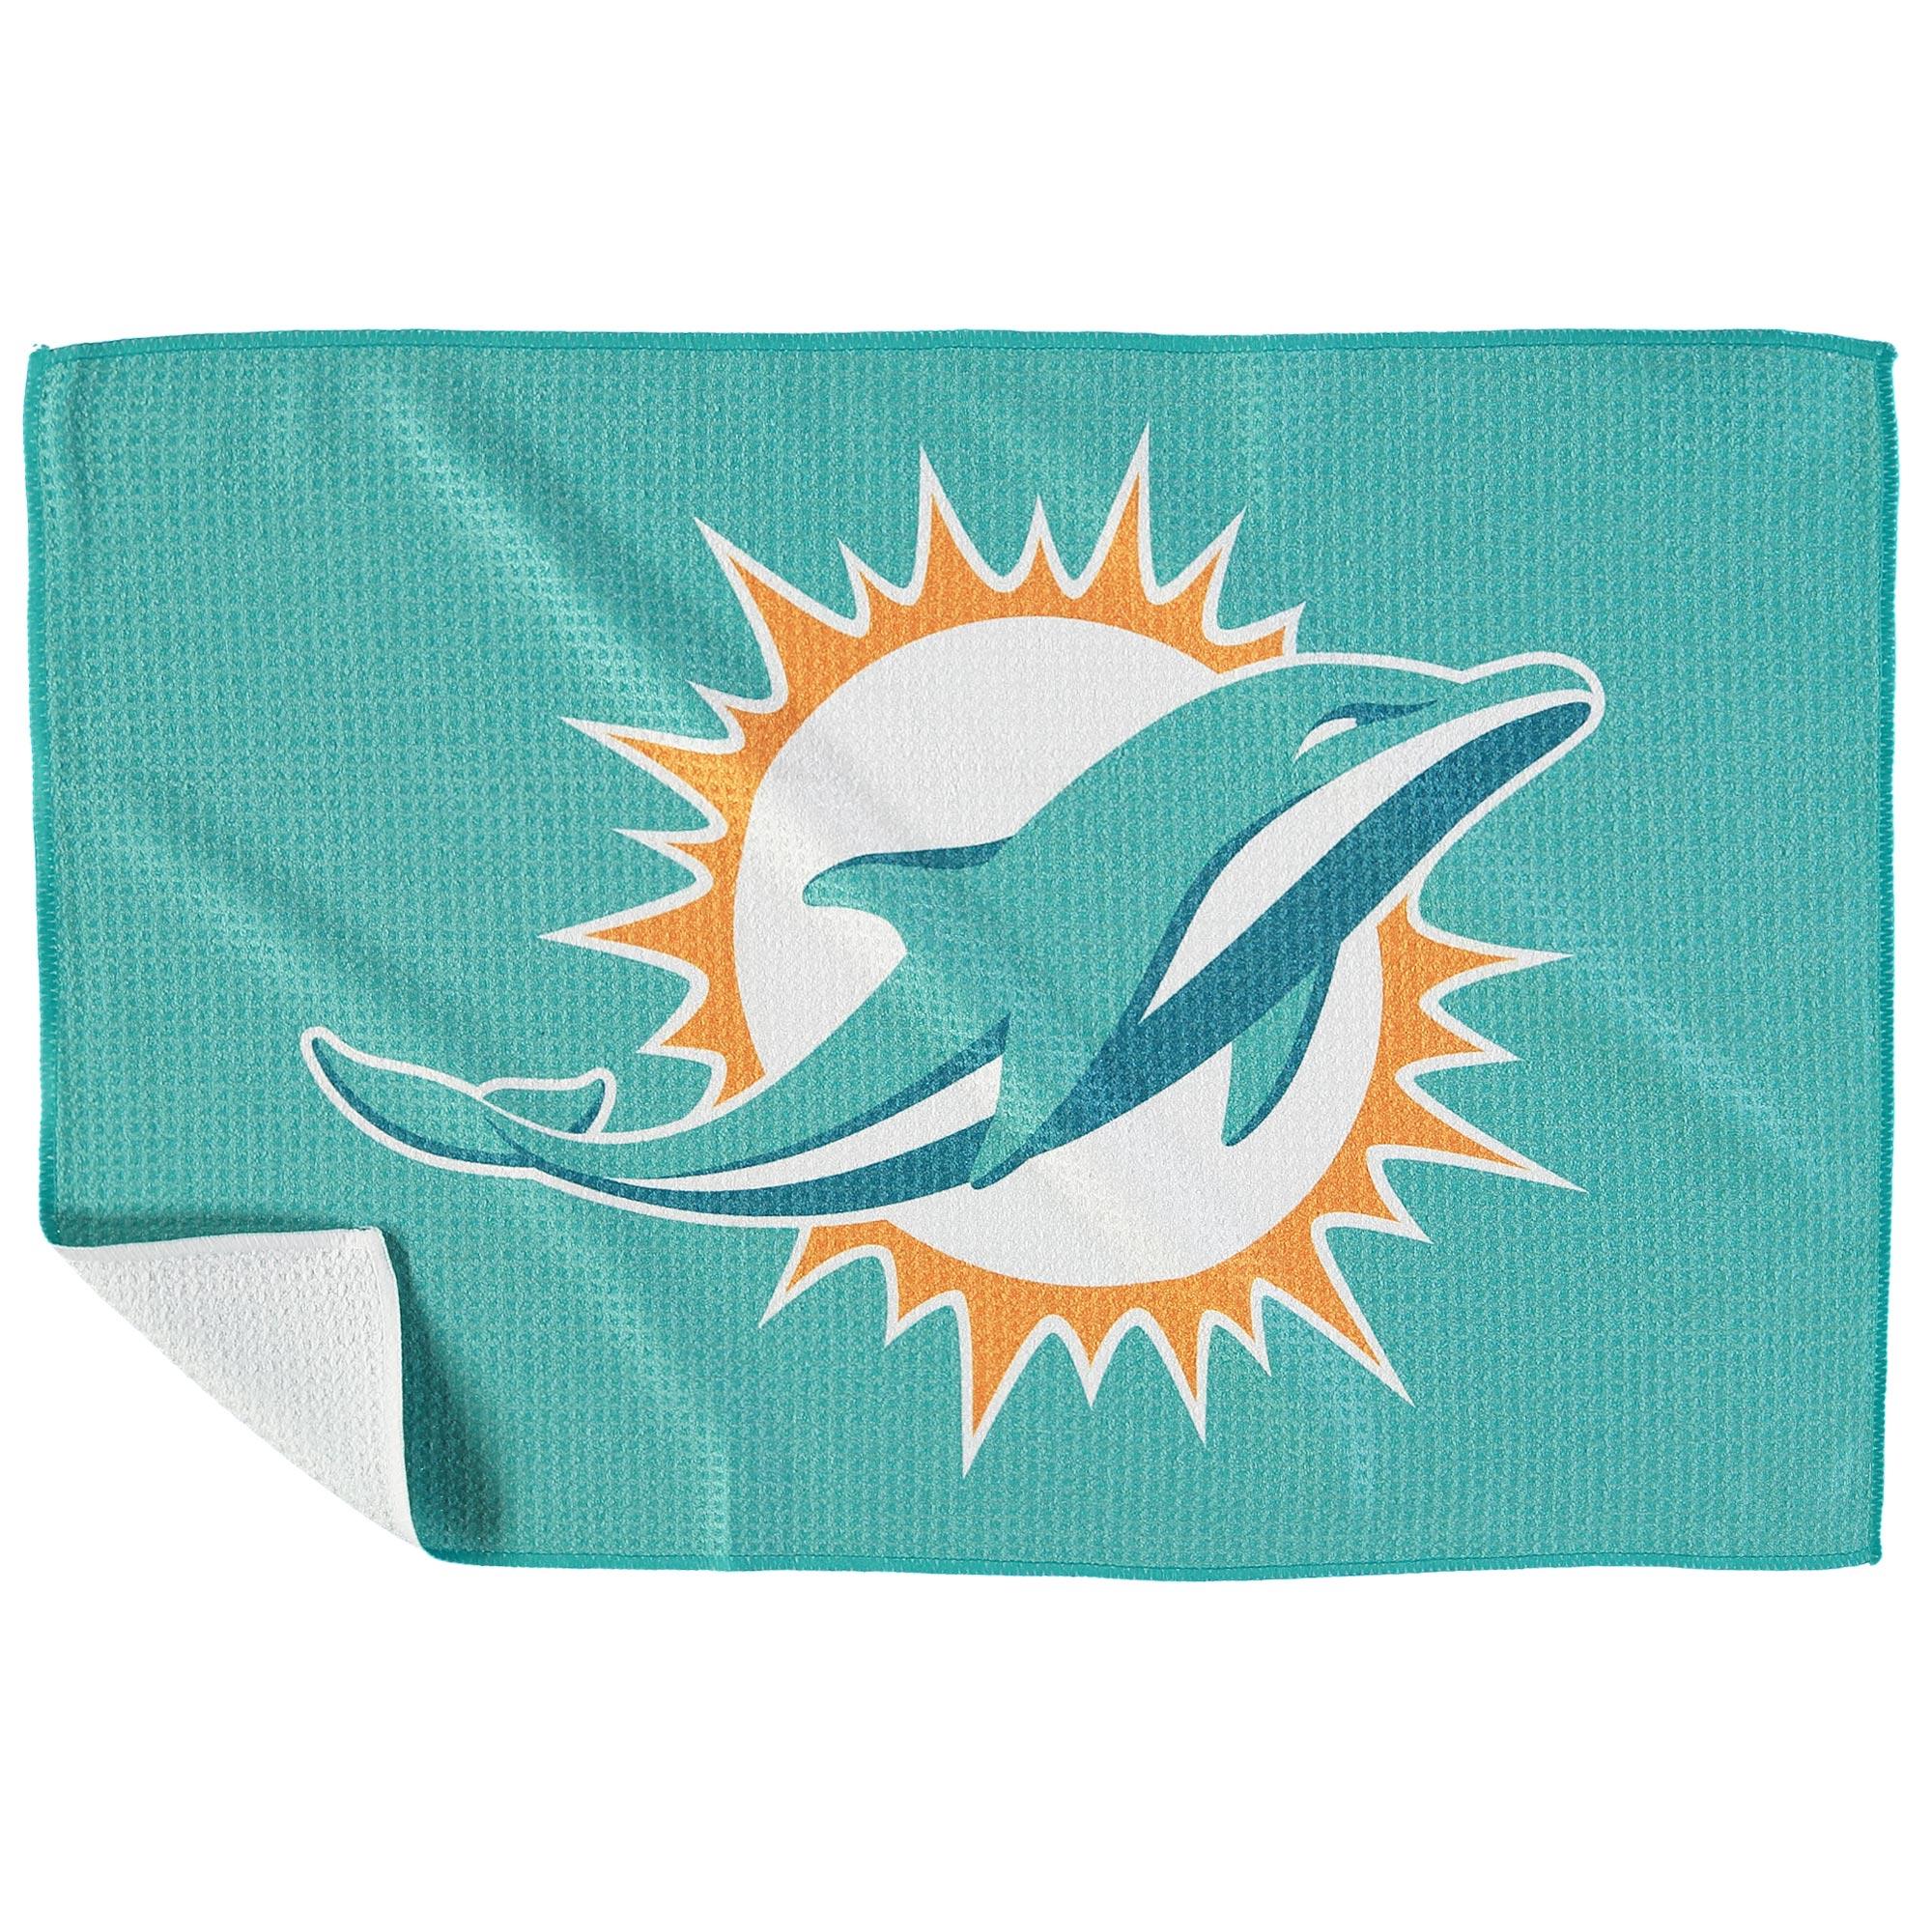 "Miami Dolphins 16"" x 24"" Microfiber Towel - No Size"